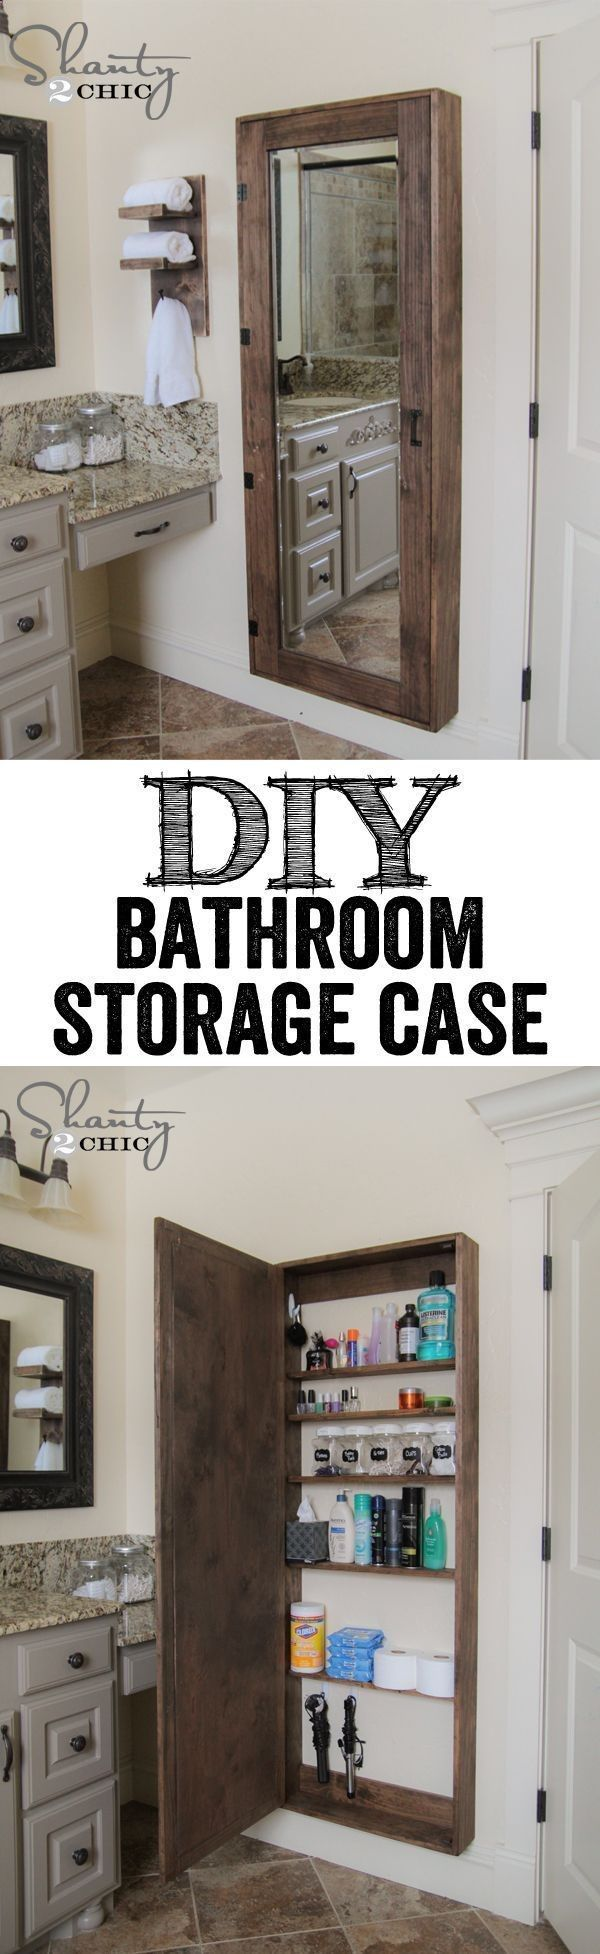 DIY Bathroom Organization Cabinet with full length mirror. 203kRehabNow.com for 203k Renovation Loans, FHA loans & refinancing nationwide.